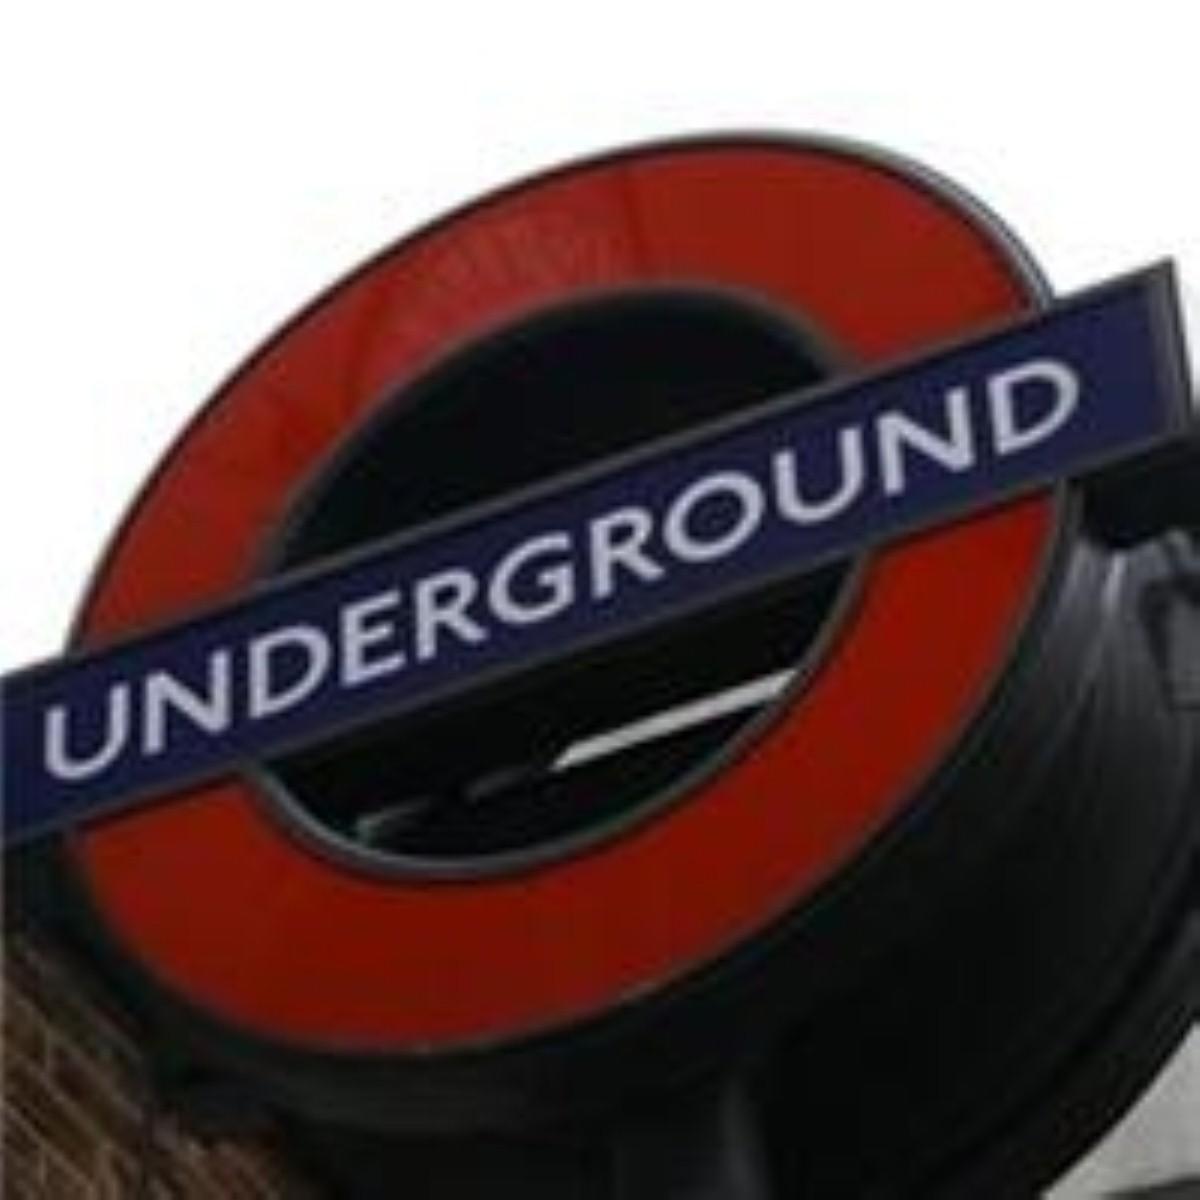 New Tube strikes announced